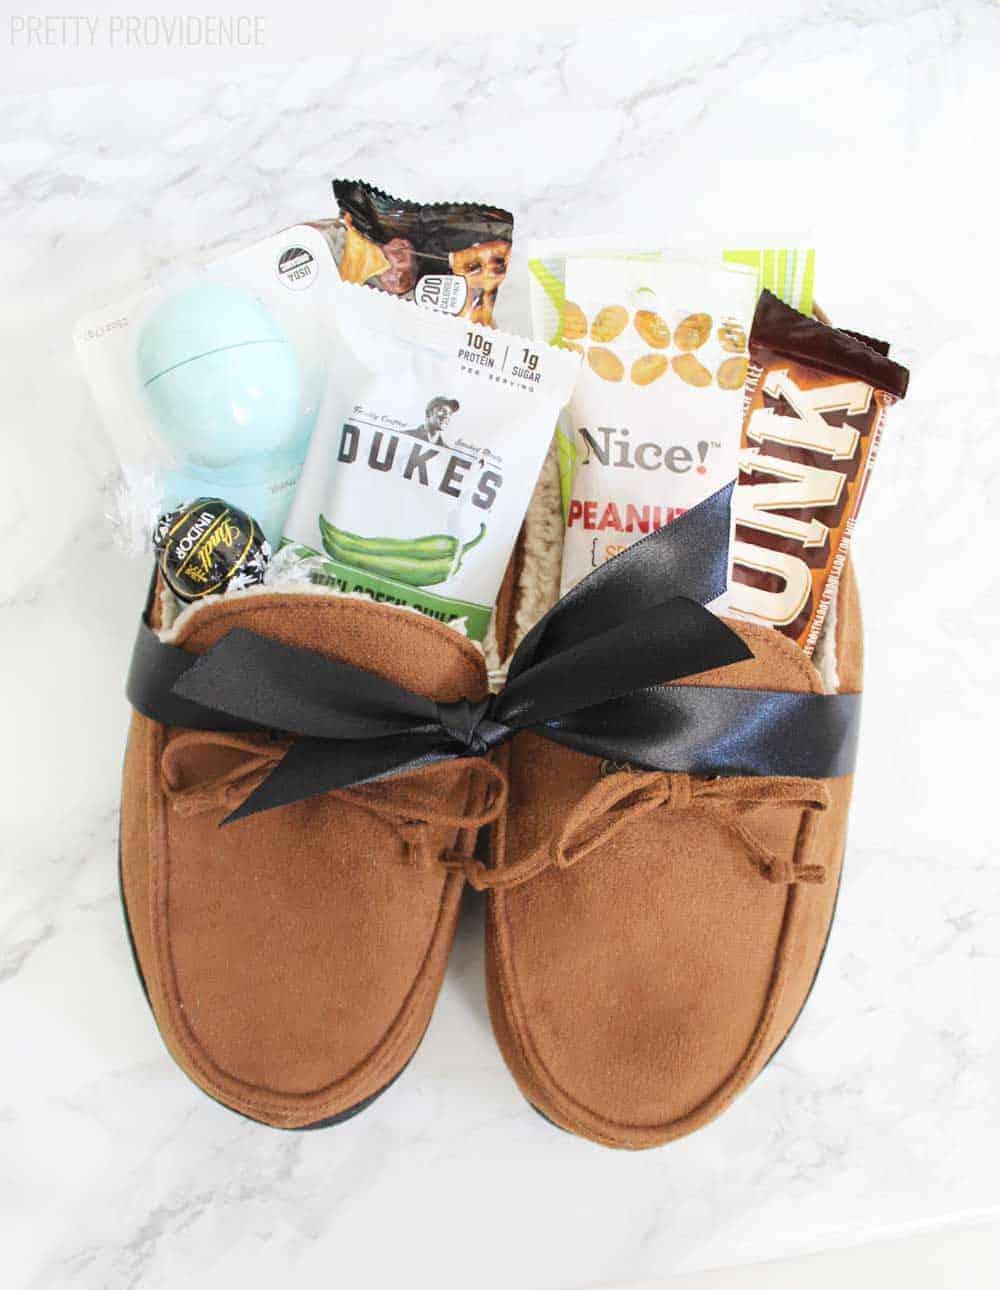 Treat stuffed slippers